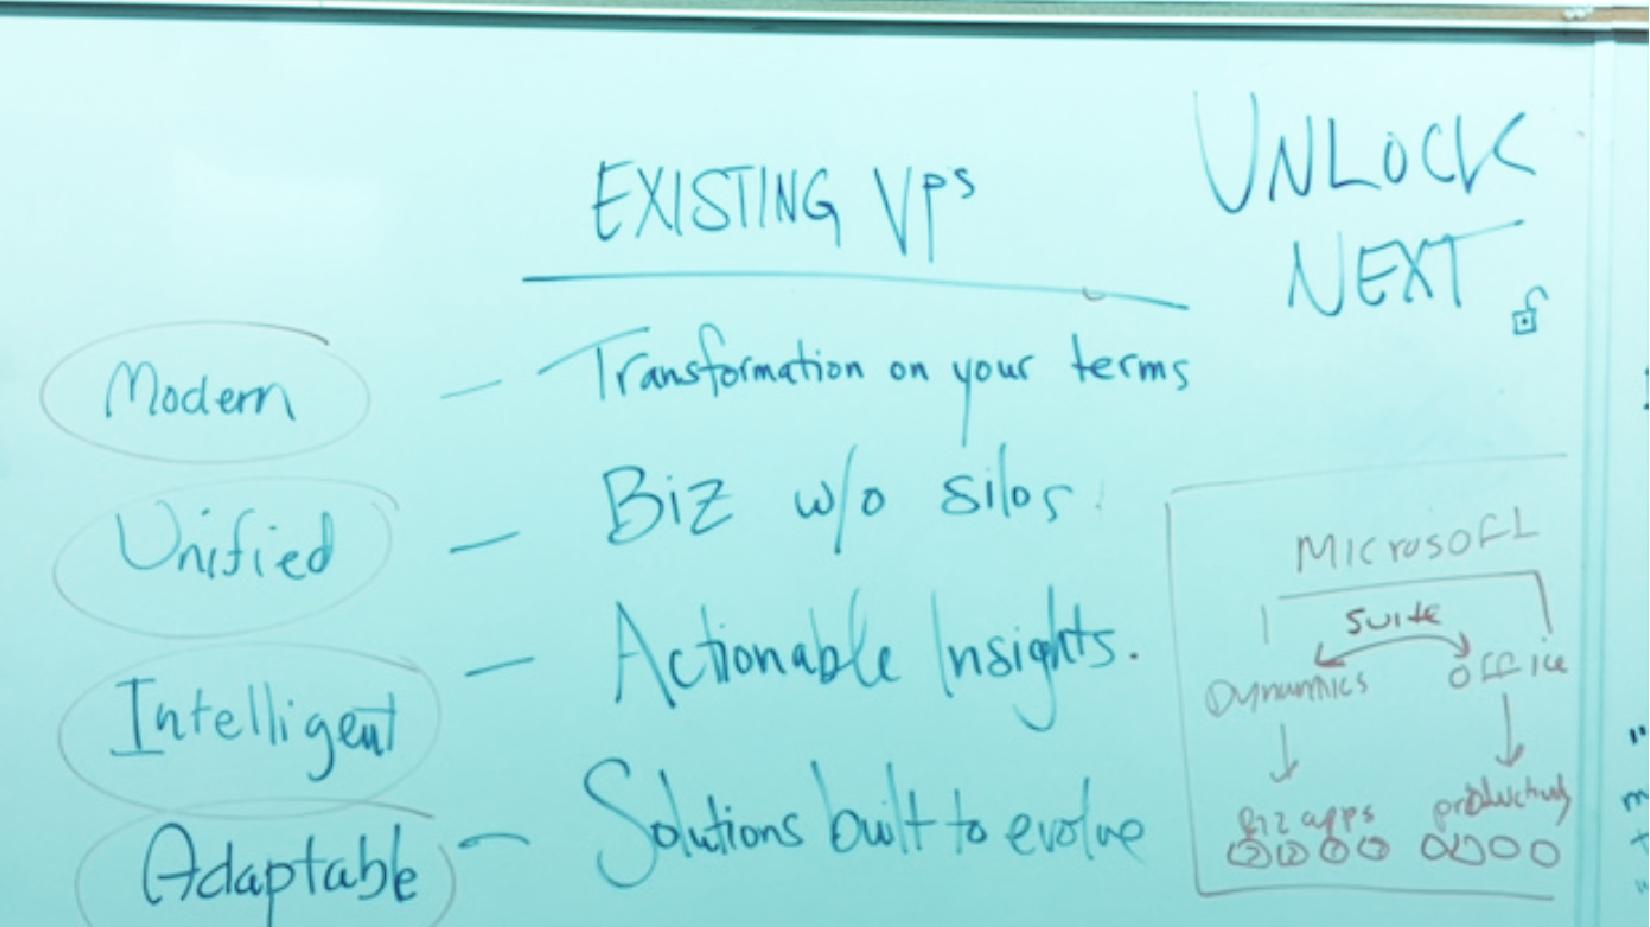 Who_Case_Study_Assest_Exploration-12.png